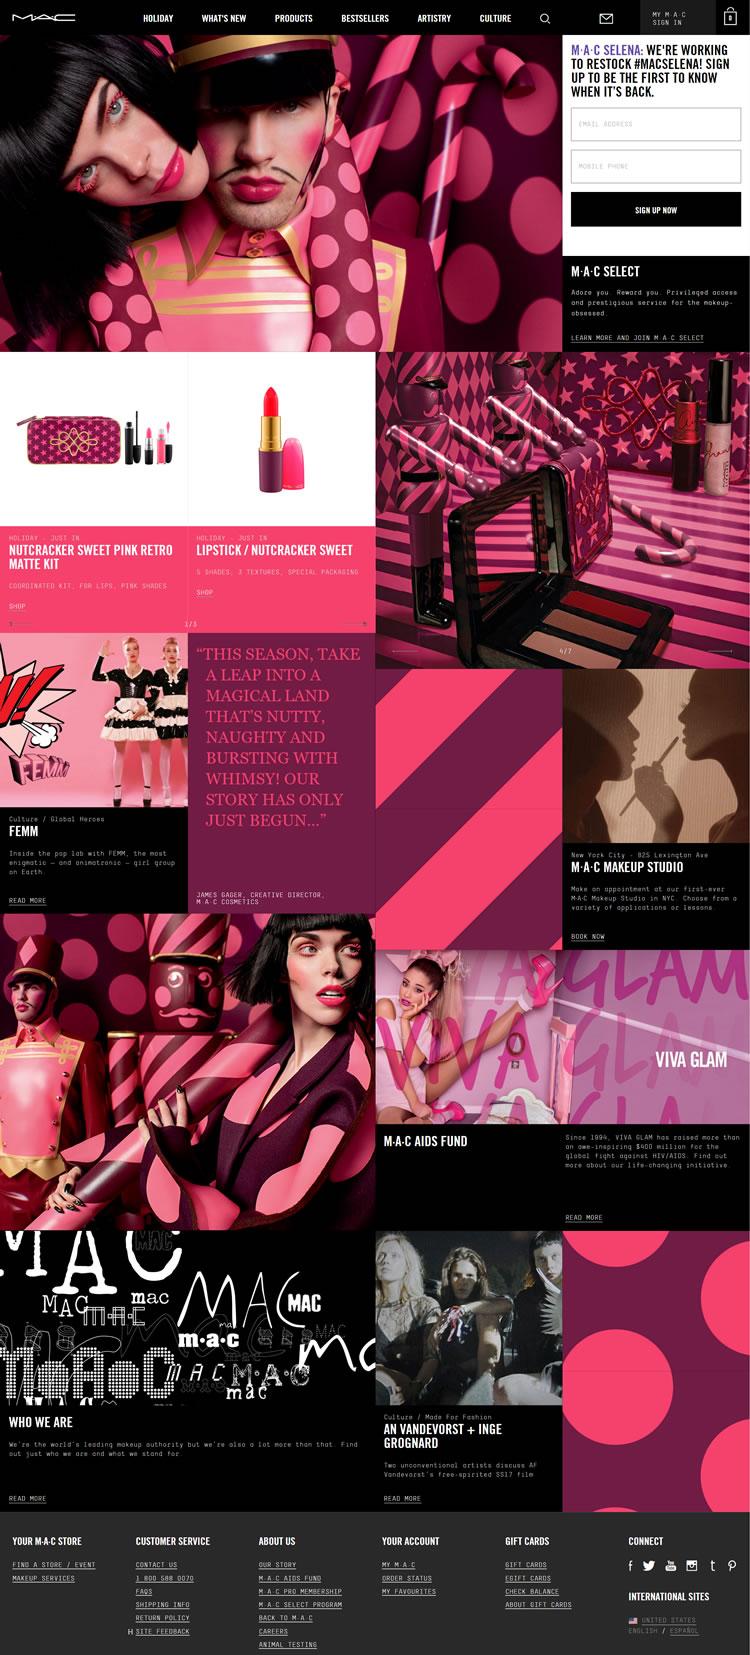 MAC Comestic官方网站:魅力专业艺术化妆